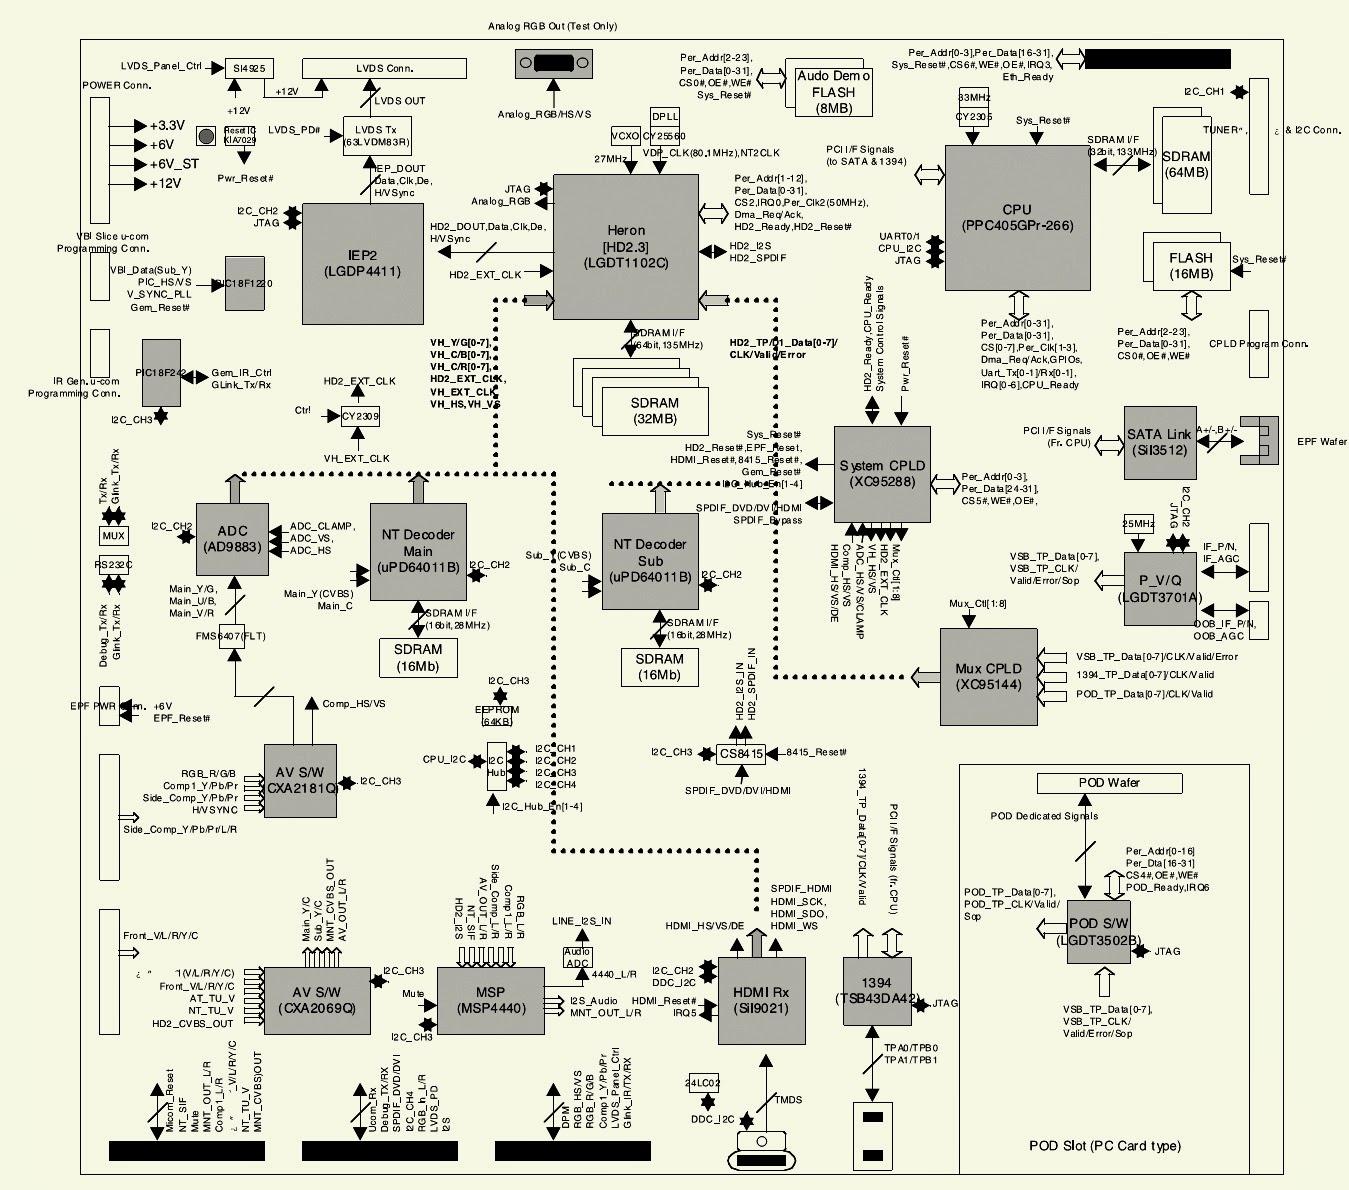 Lg 32lx1d user manual 32 lg electronics array lg 32lx1d ua lcd tv troubleshooting chart electro help rh electronicshelponline blogspot com fandeluxe Images